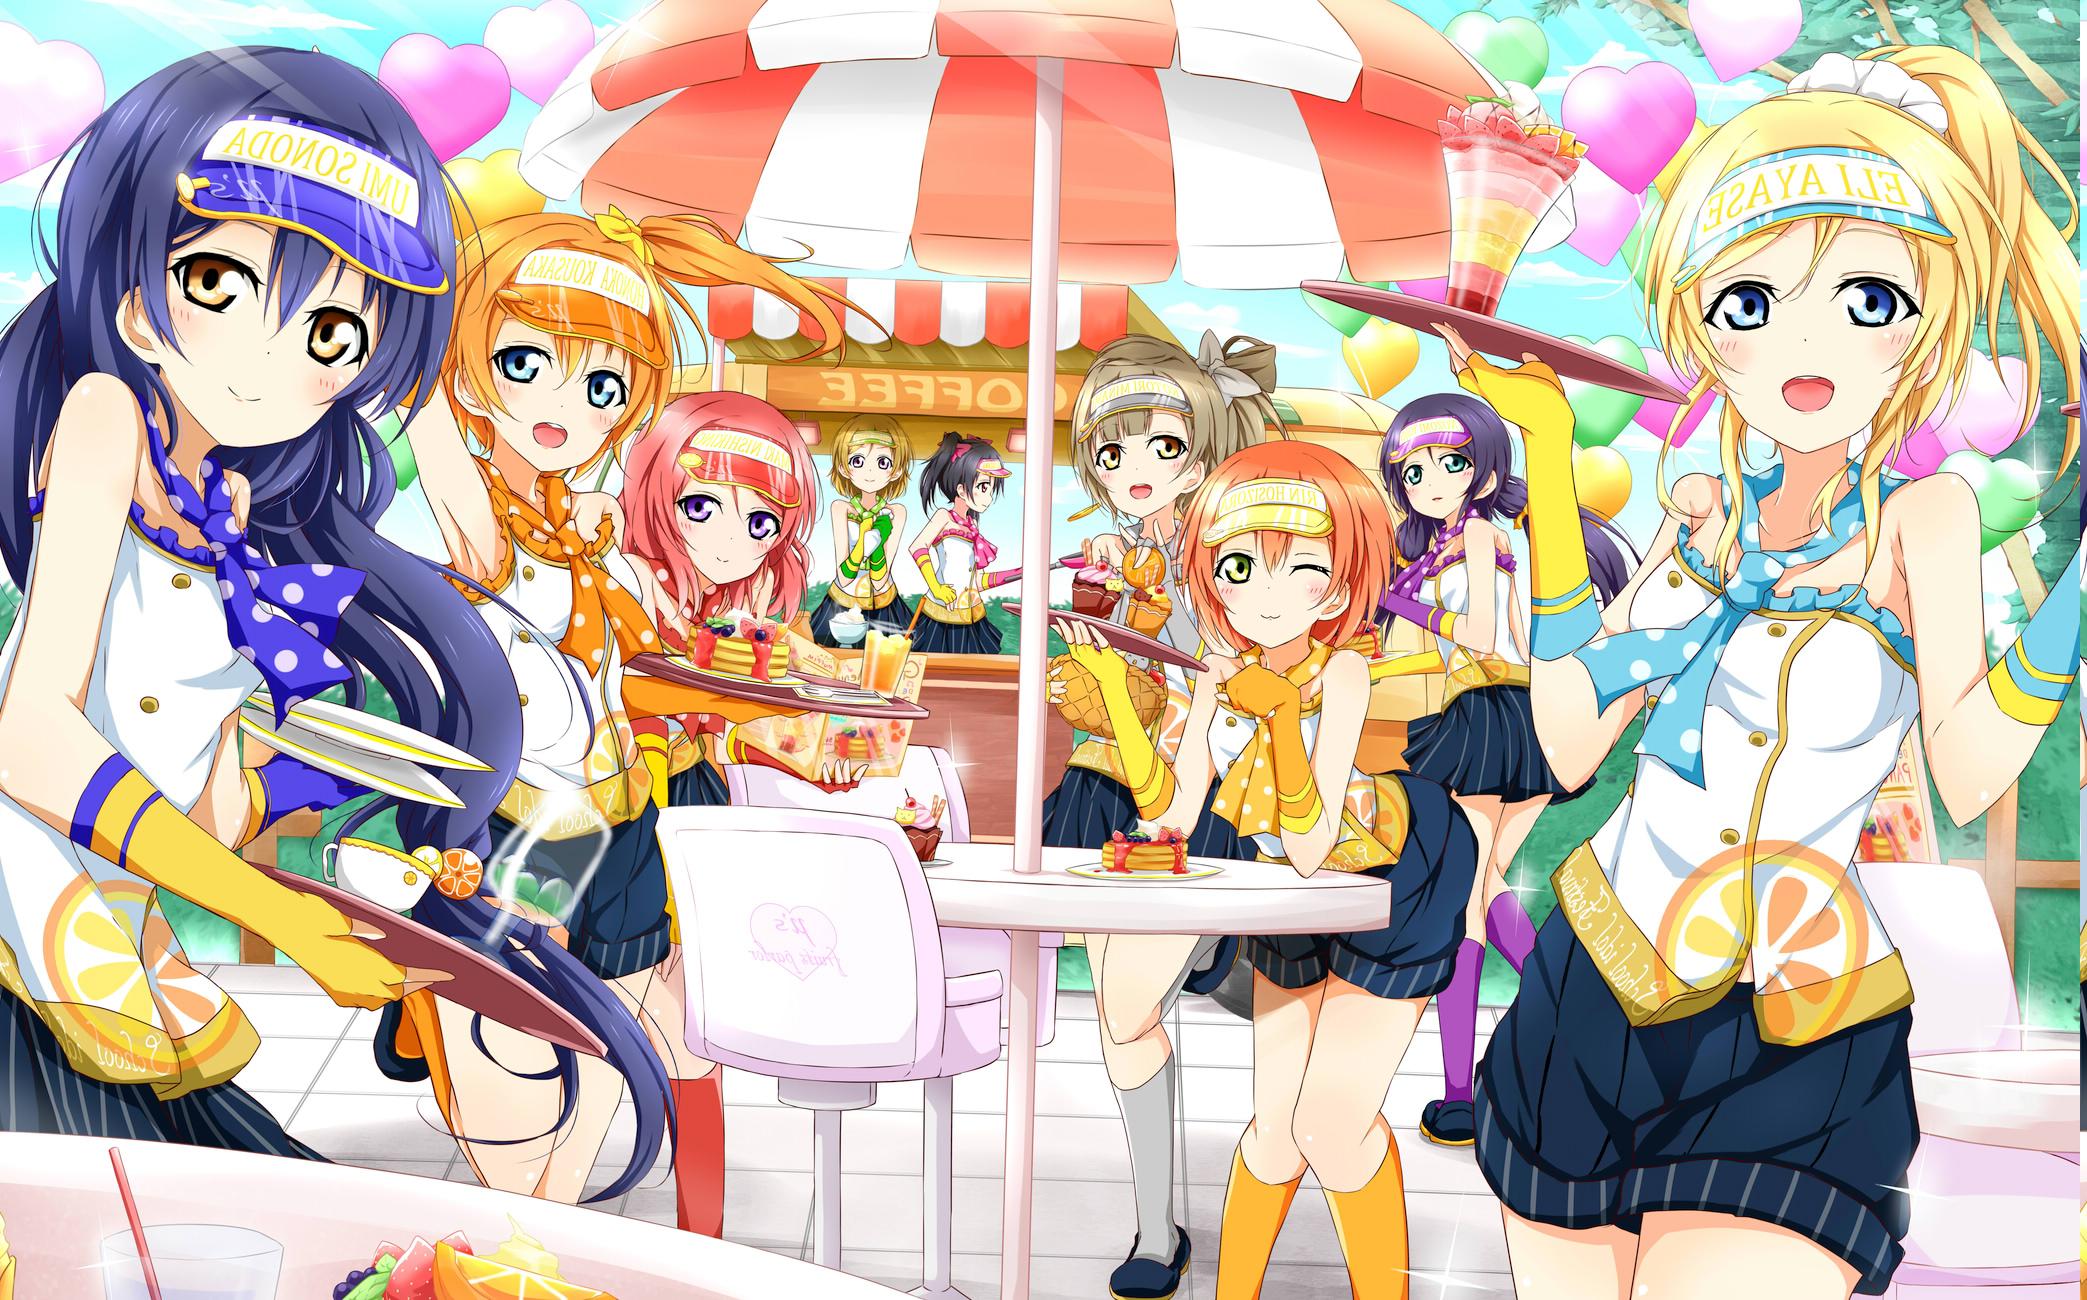 Wallpaper Illustration Anime Girls Artwork Love Live Cartoon